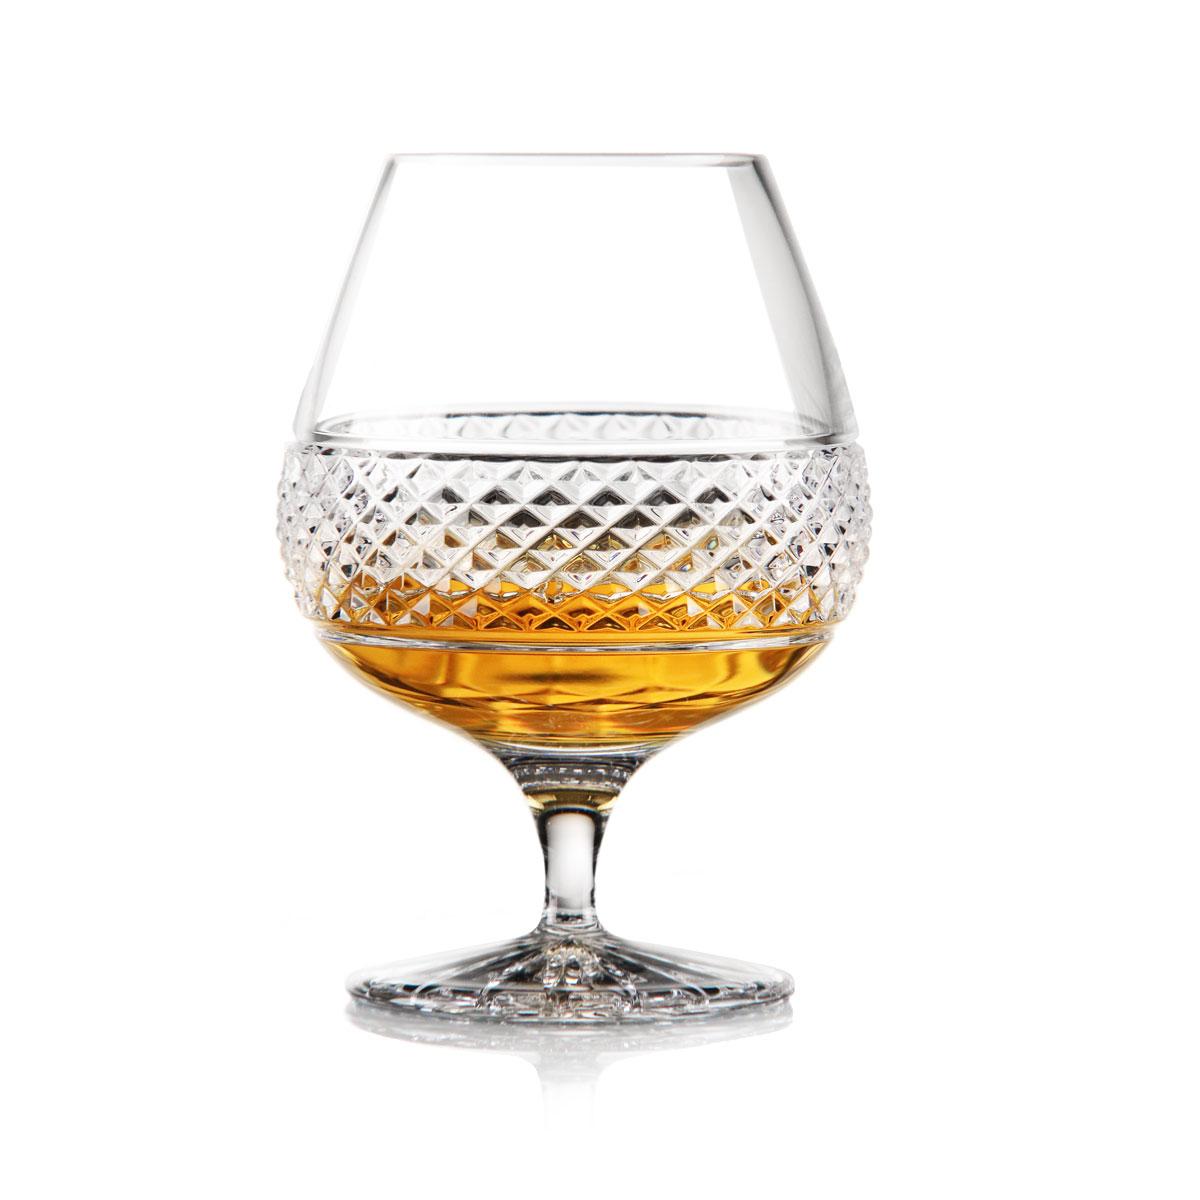 Cashs Ireland, Cooper Large Brandy, Cognac Glass, Single